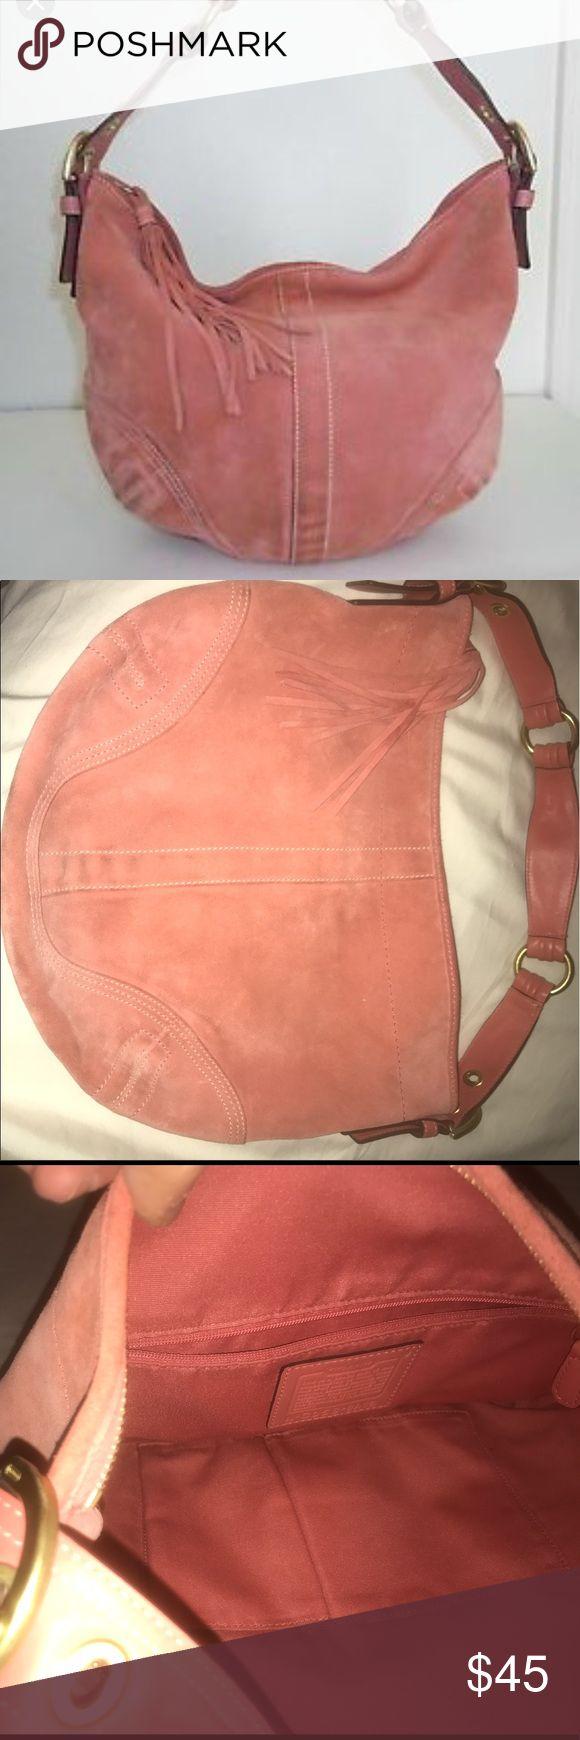 Pink coral Coach shoulder bag Medium sized shoulder bag with tassel. Zipper with interior side pocket. Worn once. Excellent condition. Coach Bags Shoulder Bags